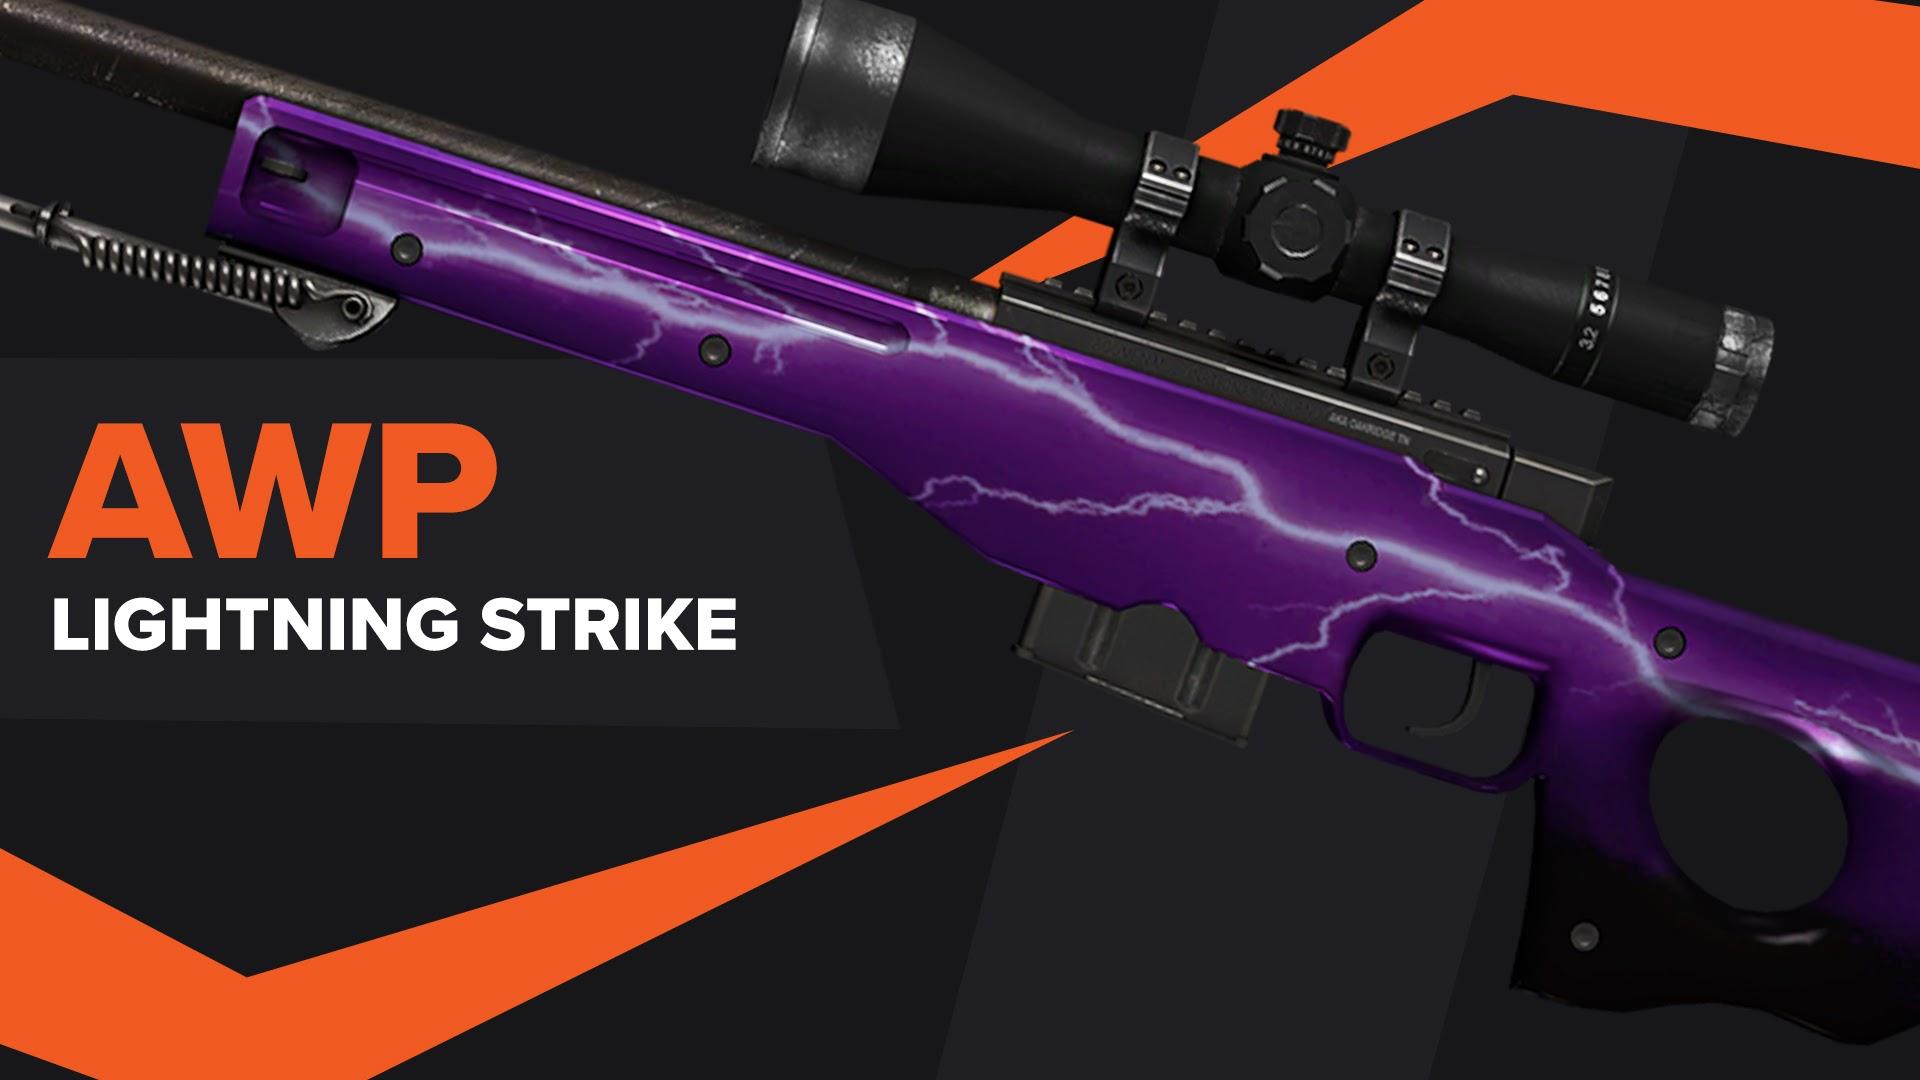 AWP Lightning Strike CSGO Skin